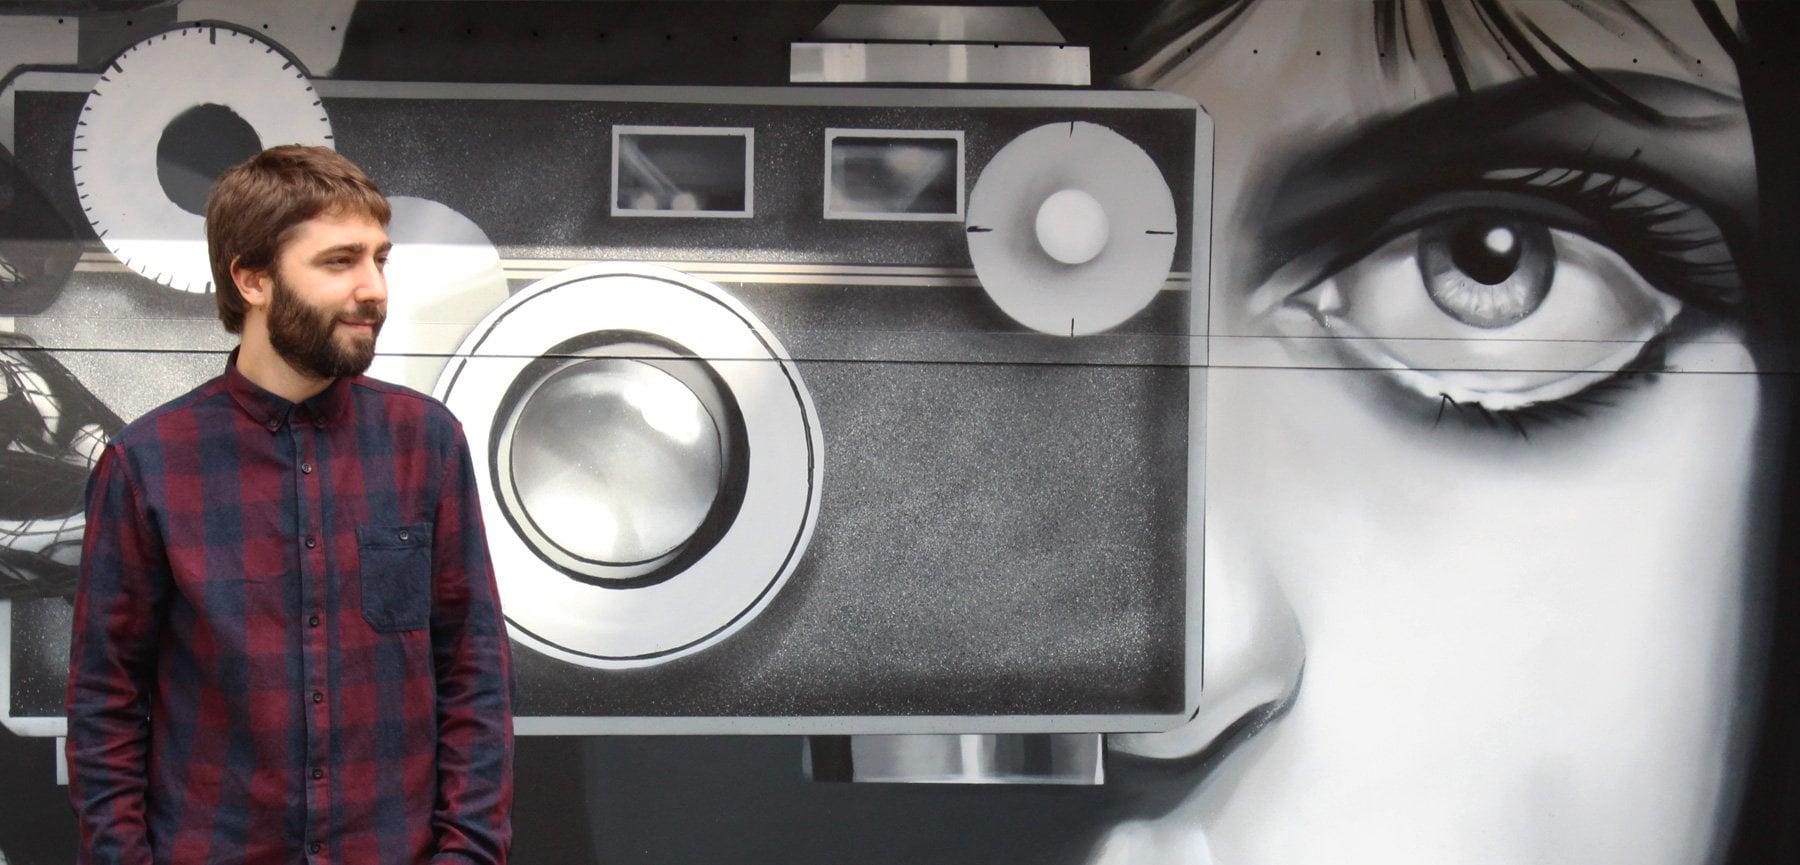 Tu Analista Digital - Presentación de Christian Núñez